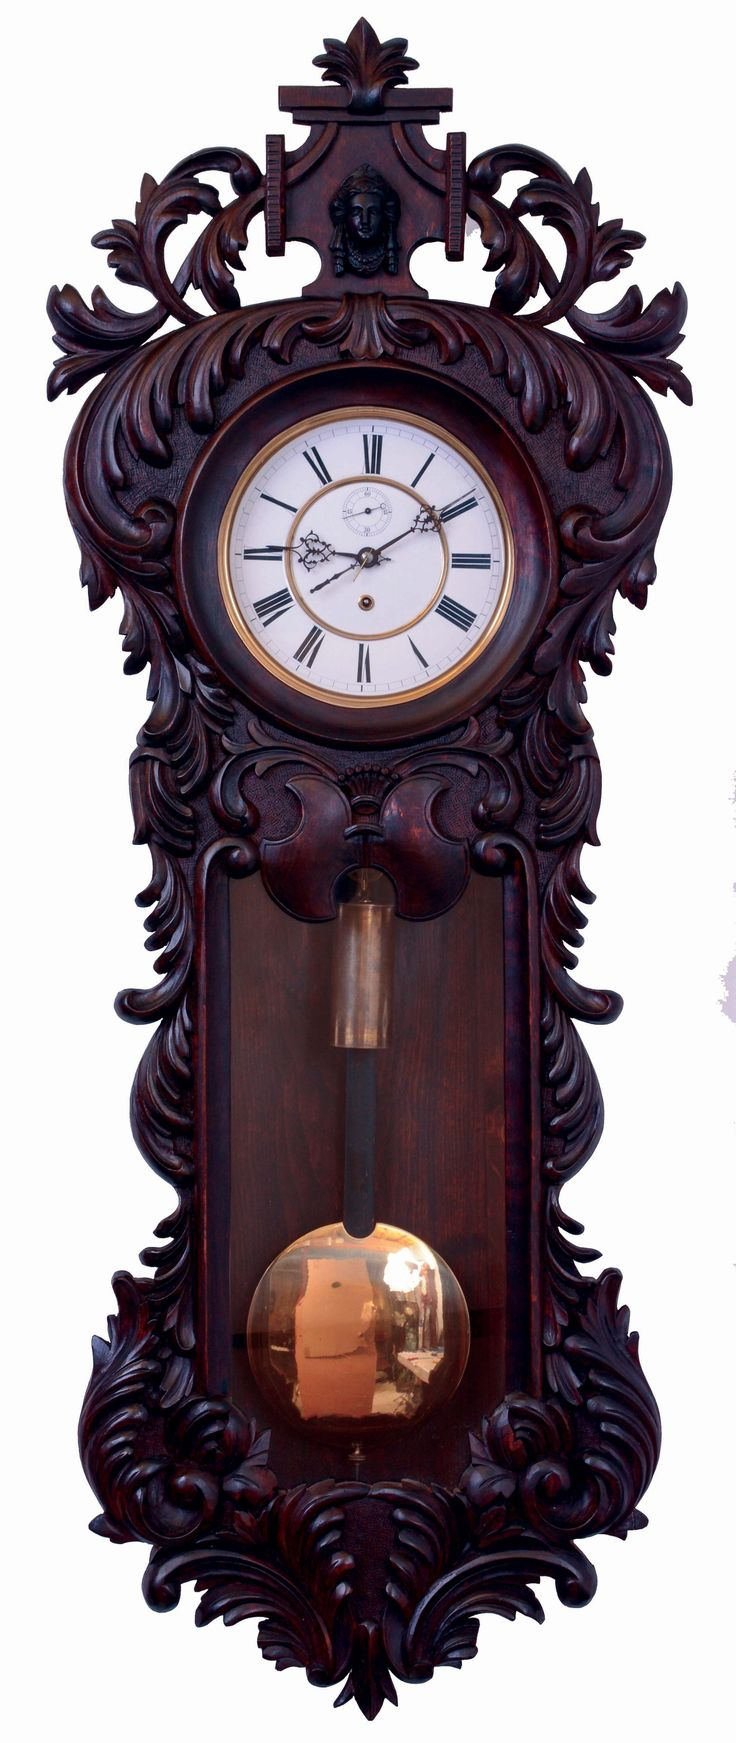 Pin By Lenzkirchfan On Lenzkirch Clocks Antique Clocks